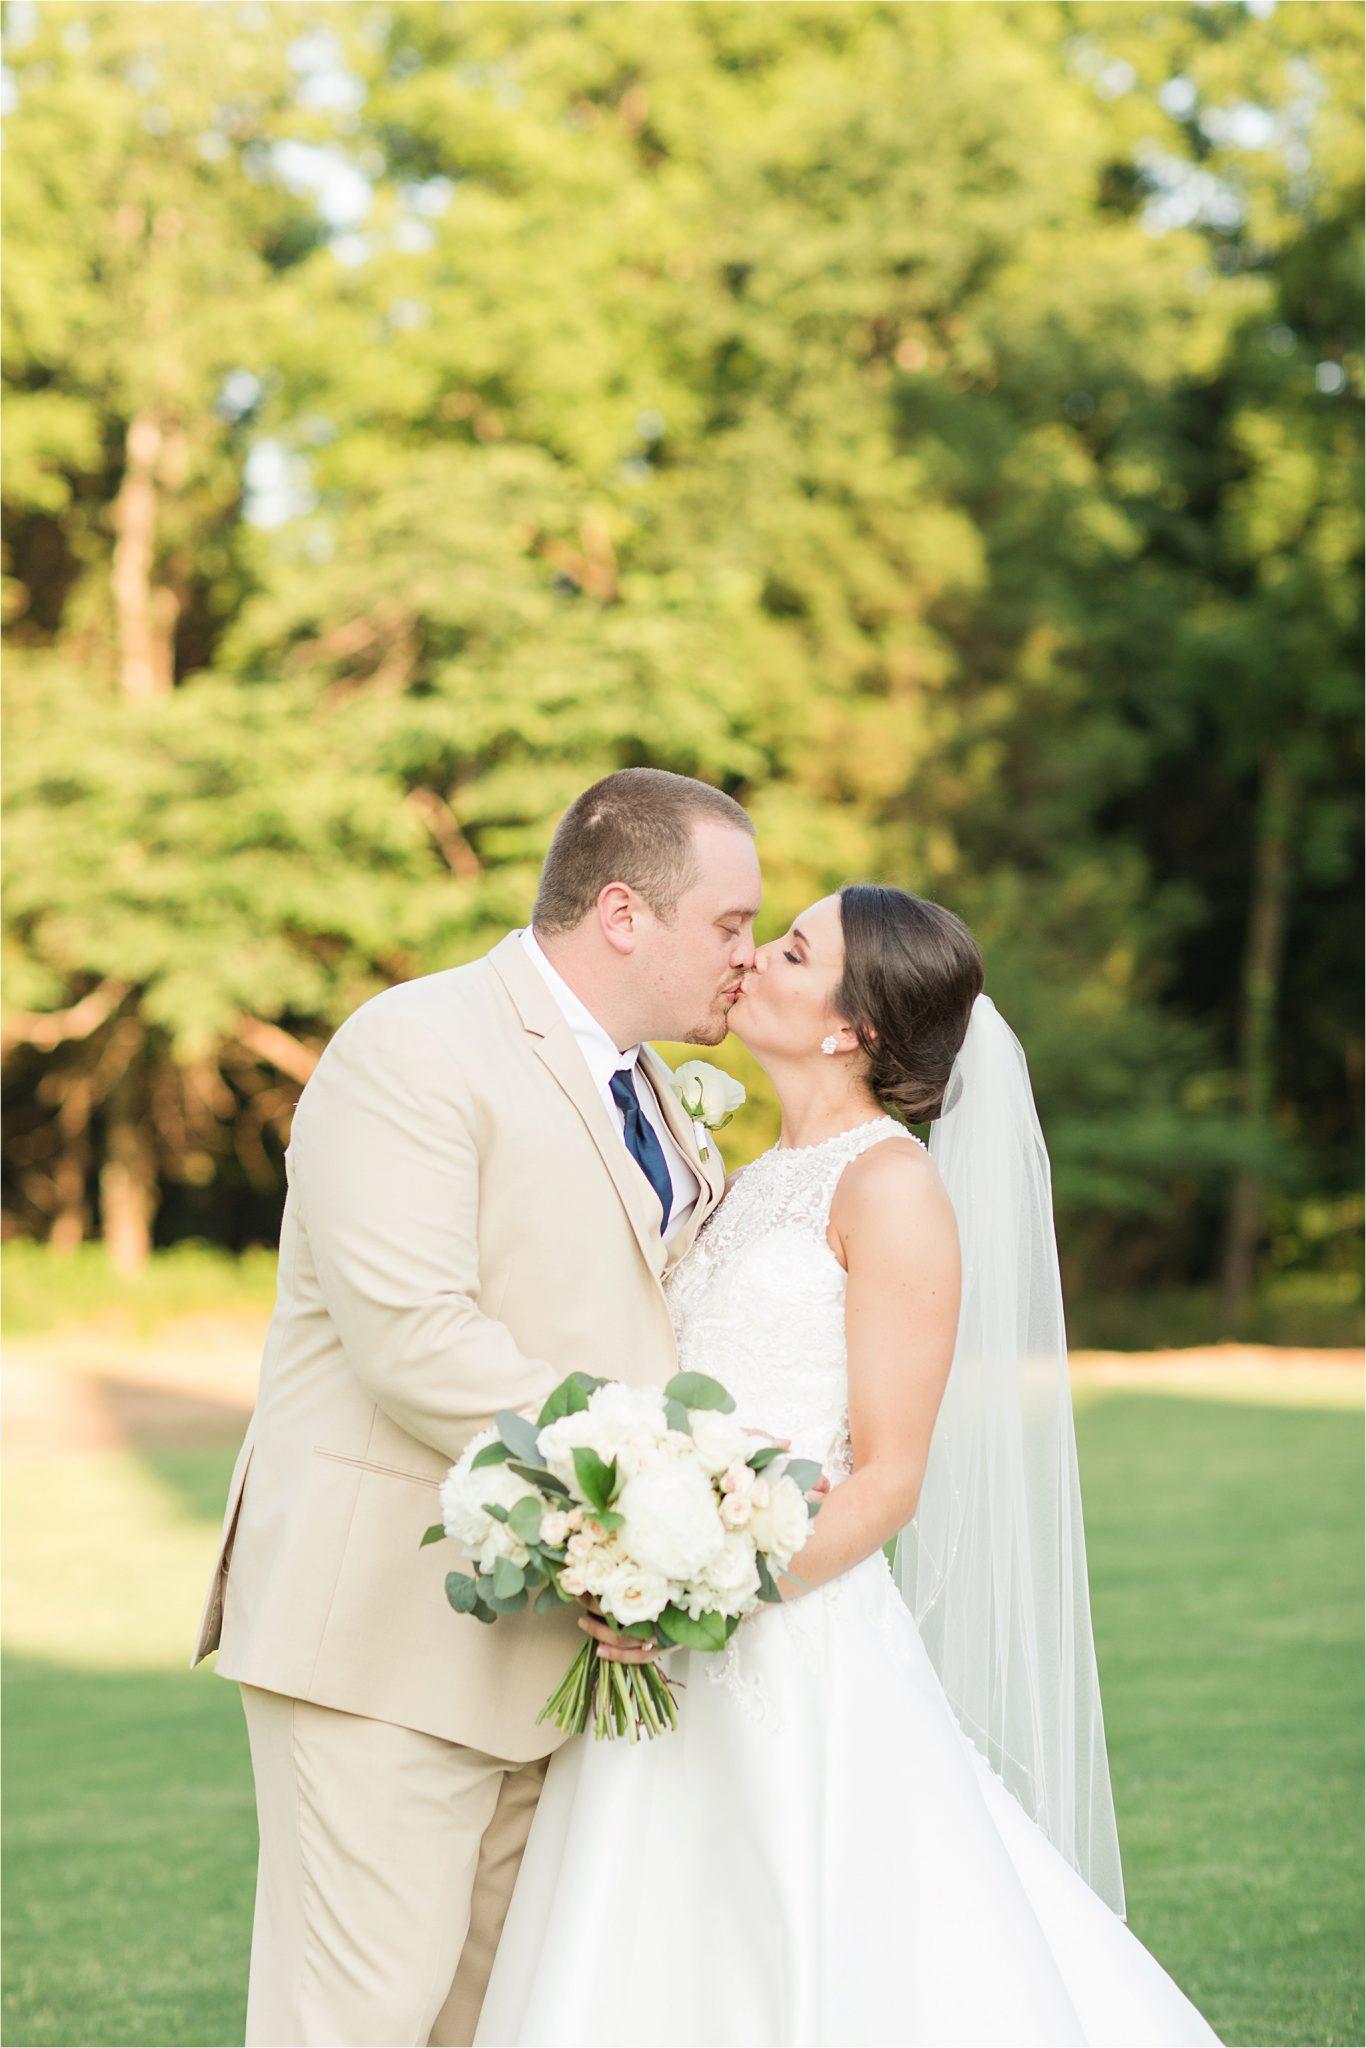 Sonnet House, Birmingham Alabama Wedding Photographer, Romantic wedding shoot